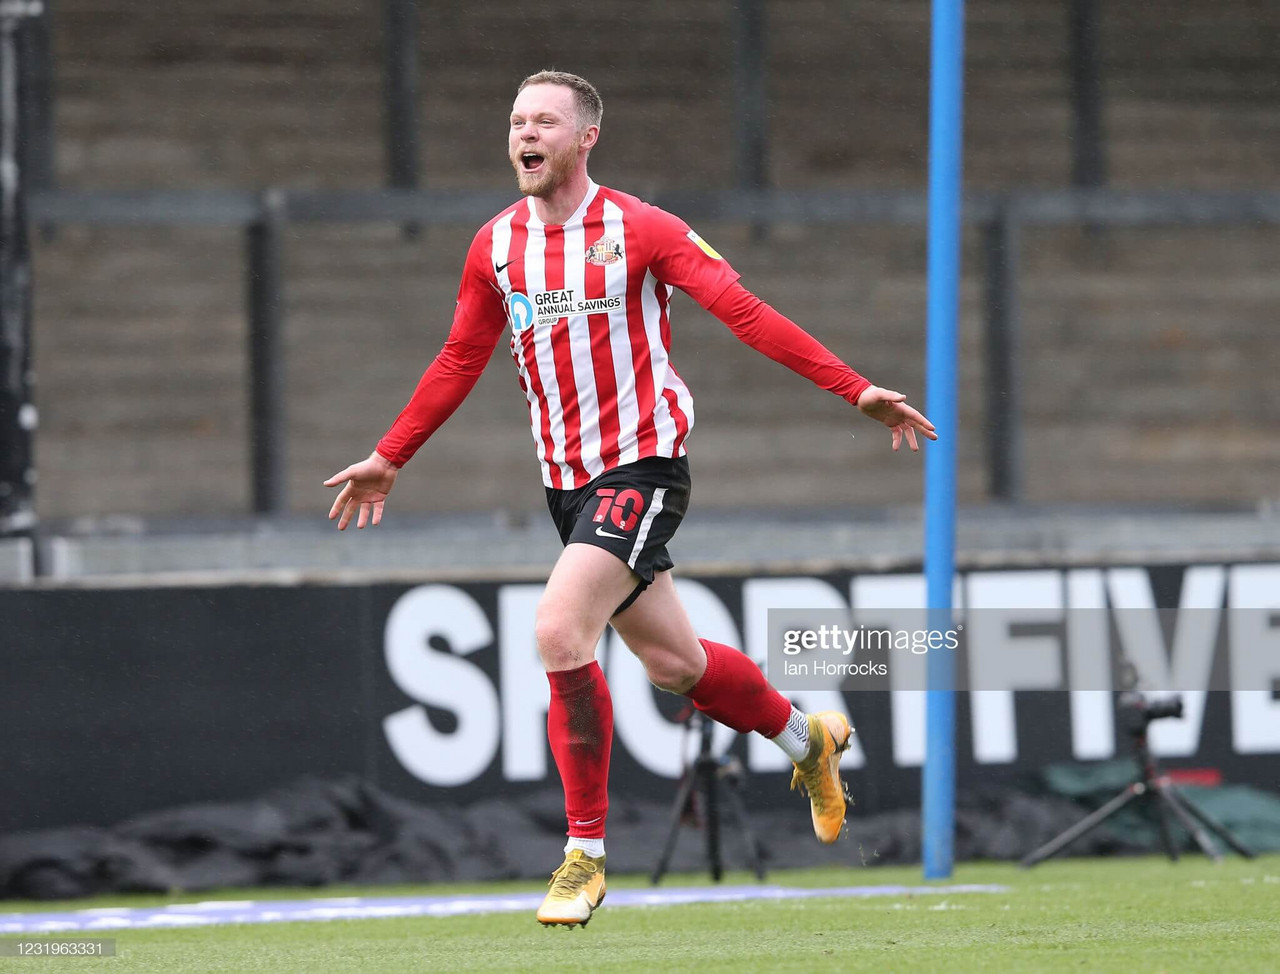 Bristol Rovers 0-1 Sunderland: O'Brien goal keeps pressure on top two